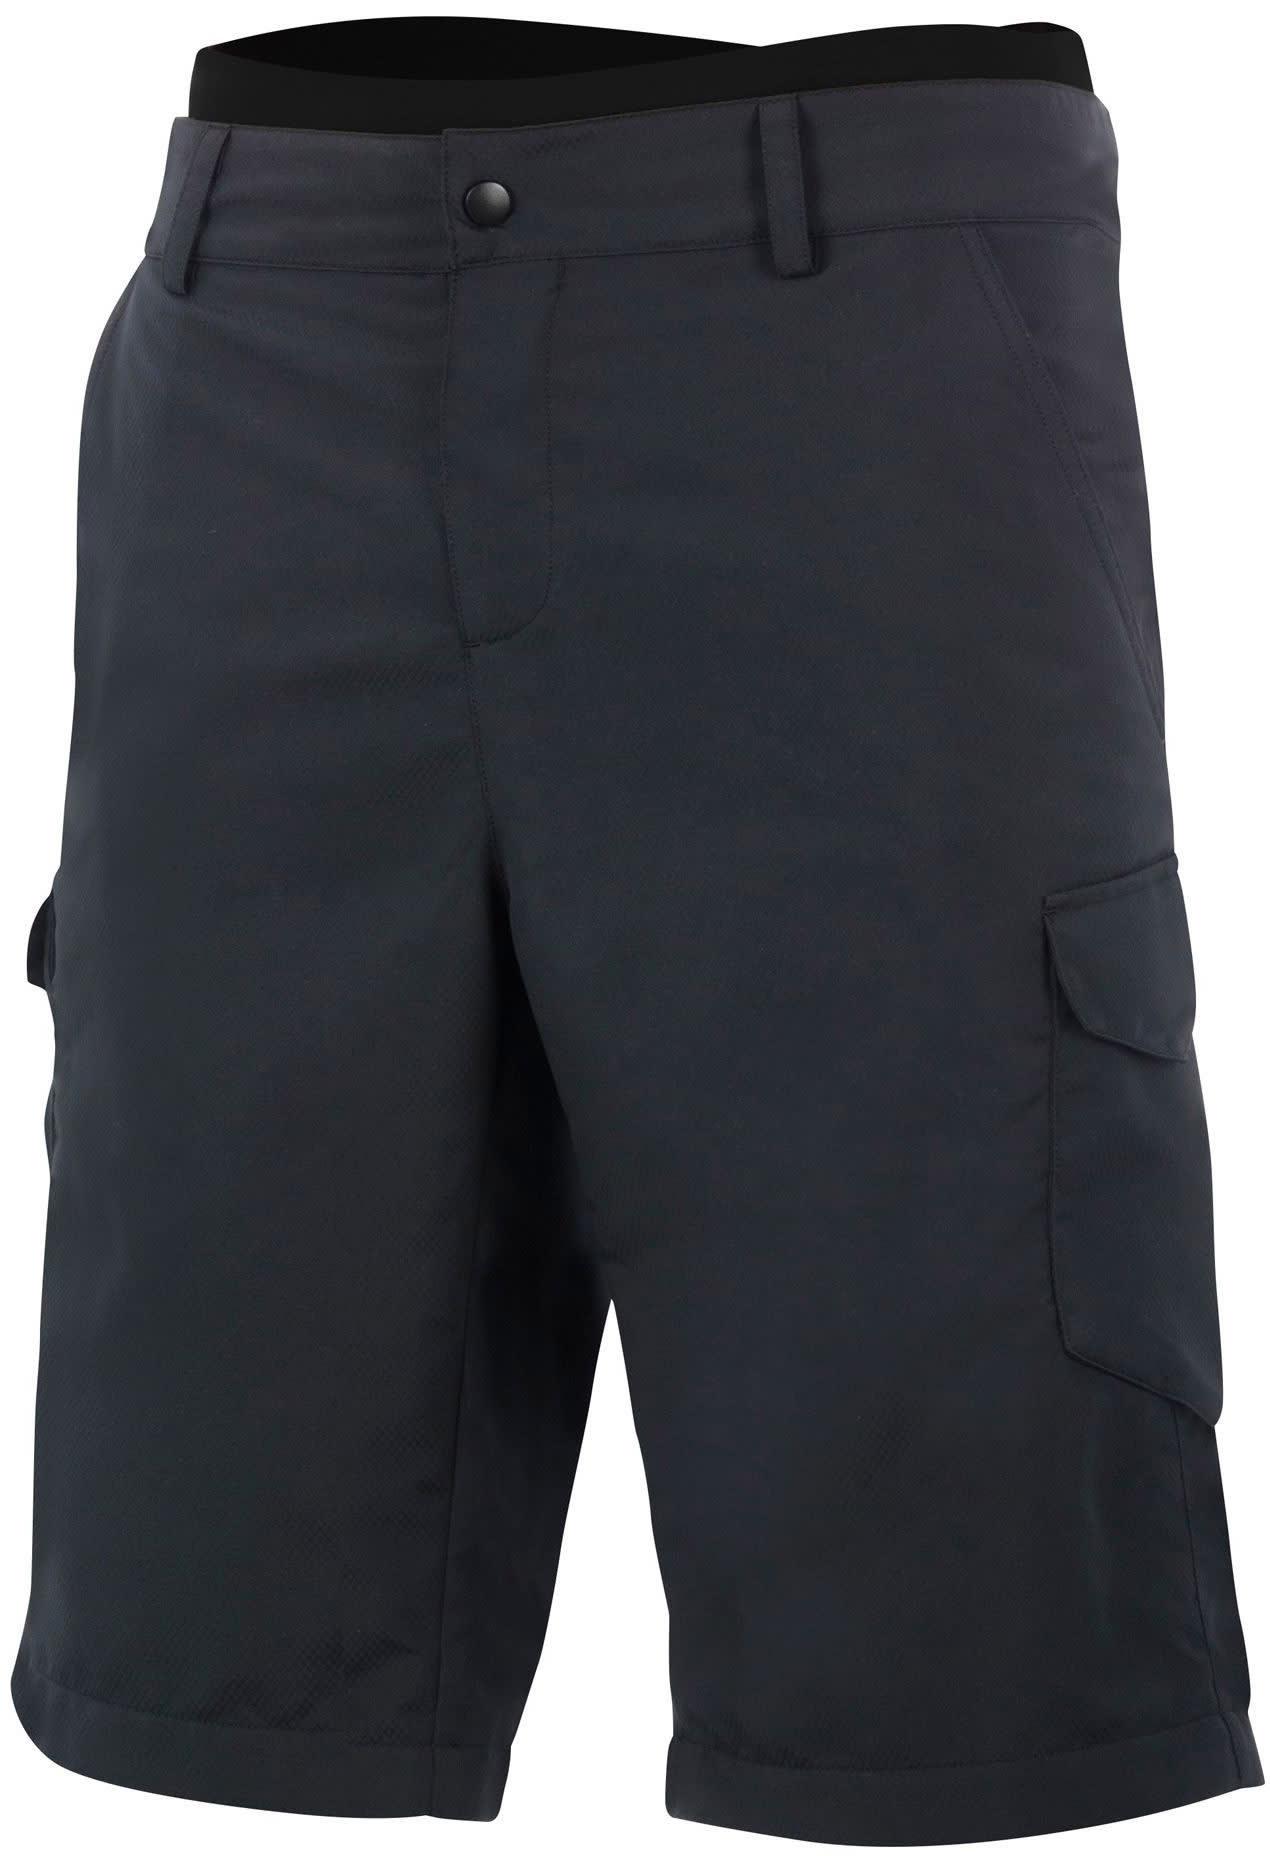 Image of Alpinestars Rover Bike Shorts